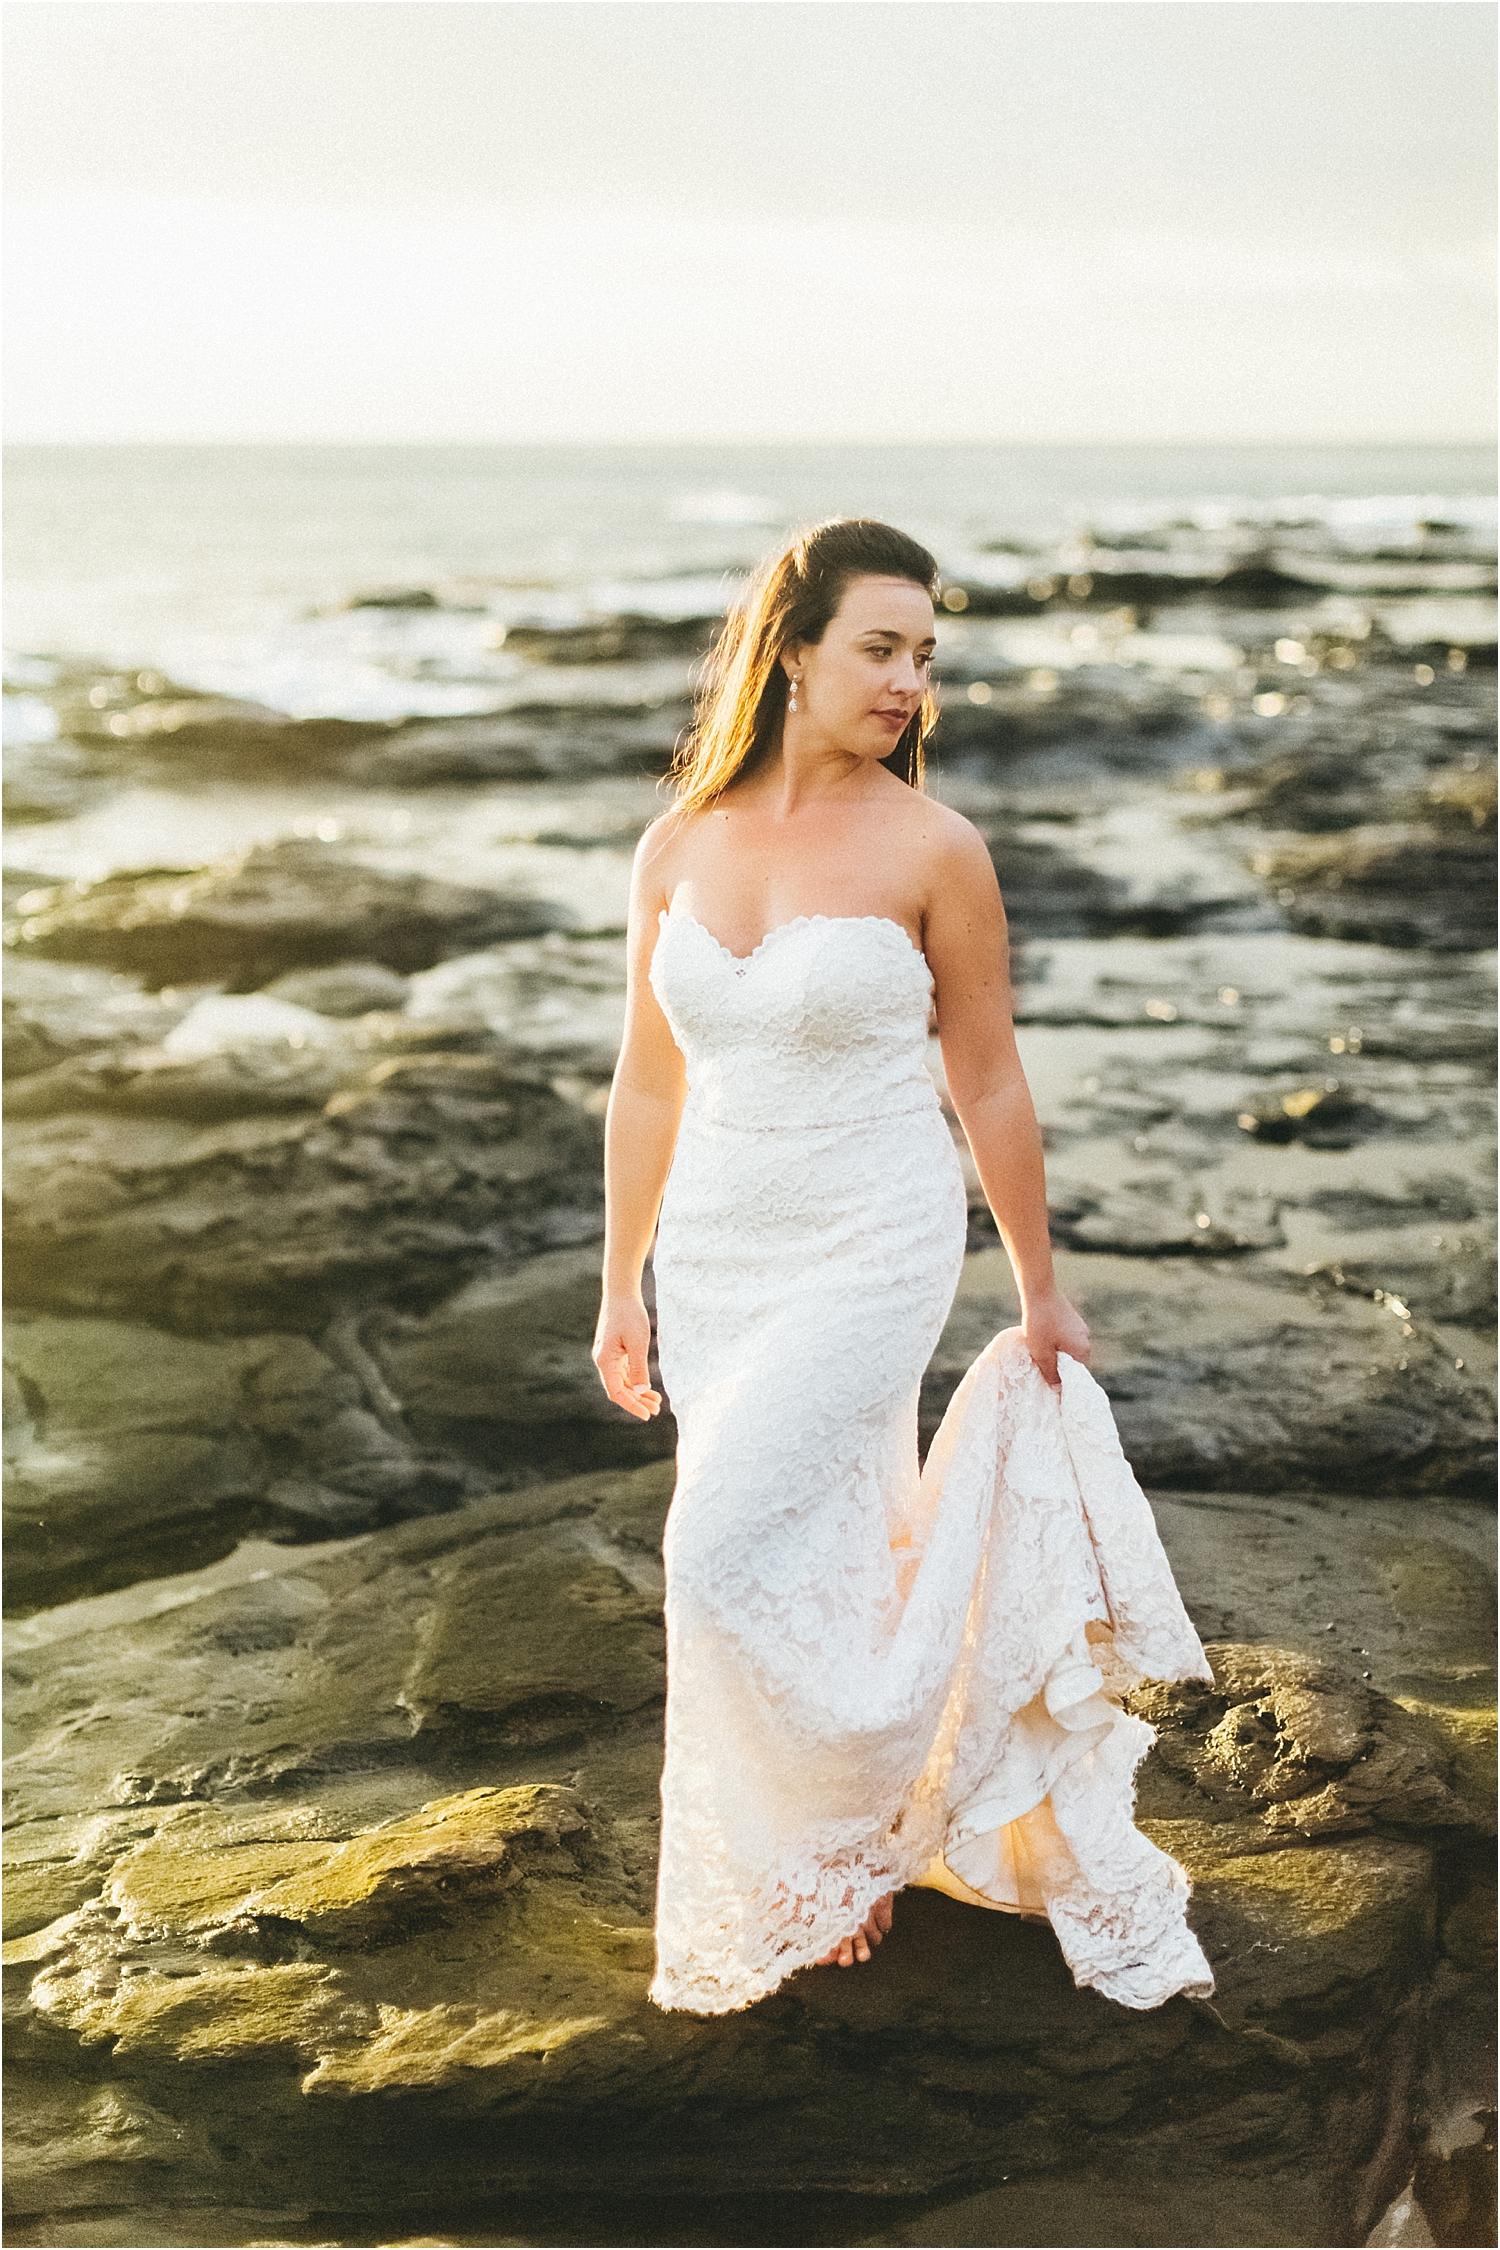 angie-diaz-photography-maui-wedding-ironwoods-beach_0005.jpg